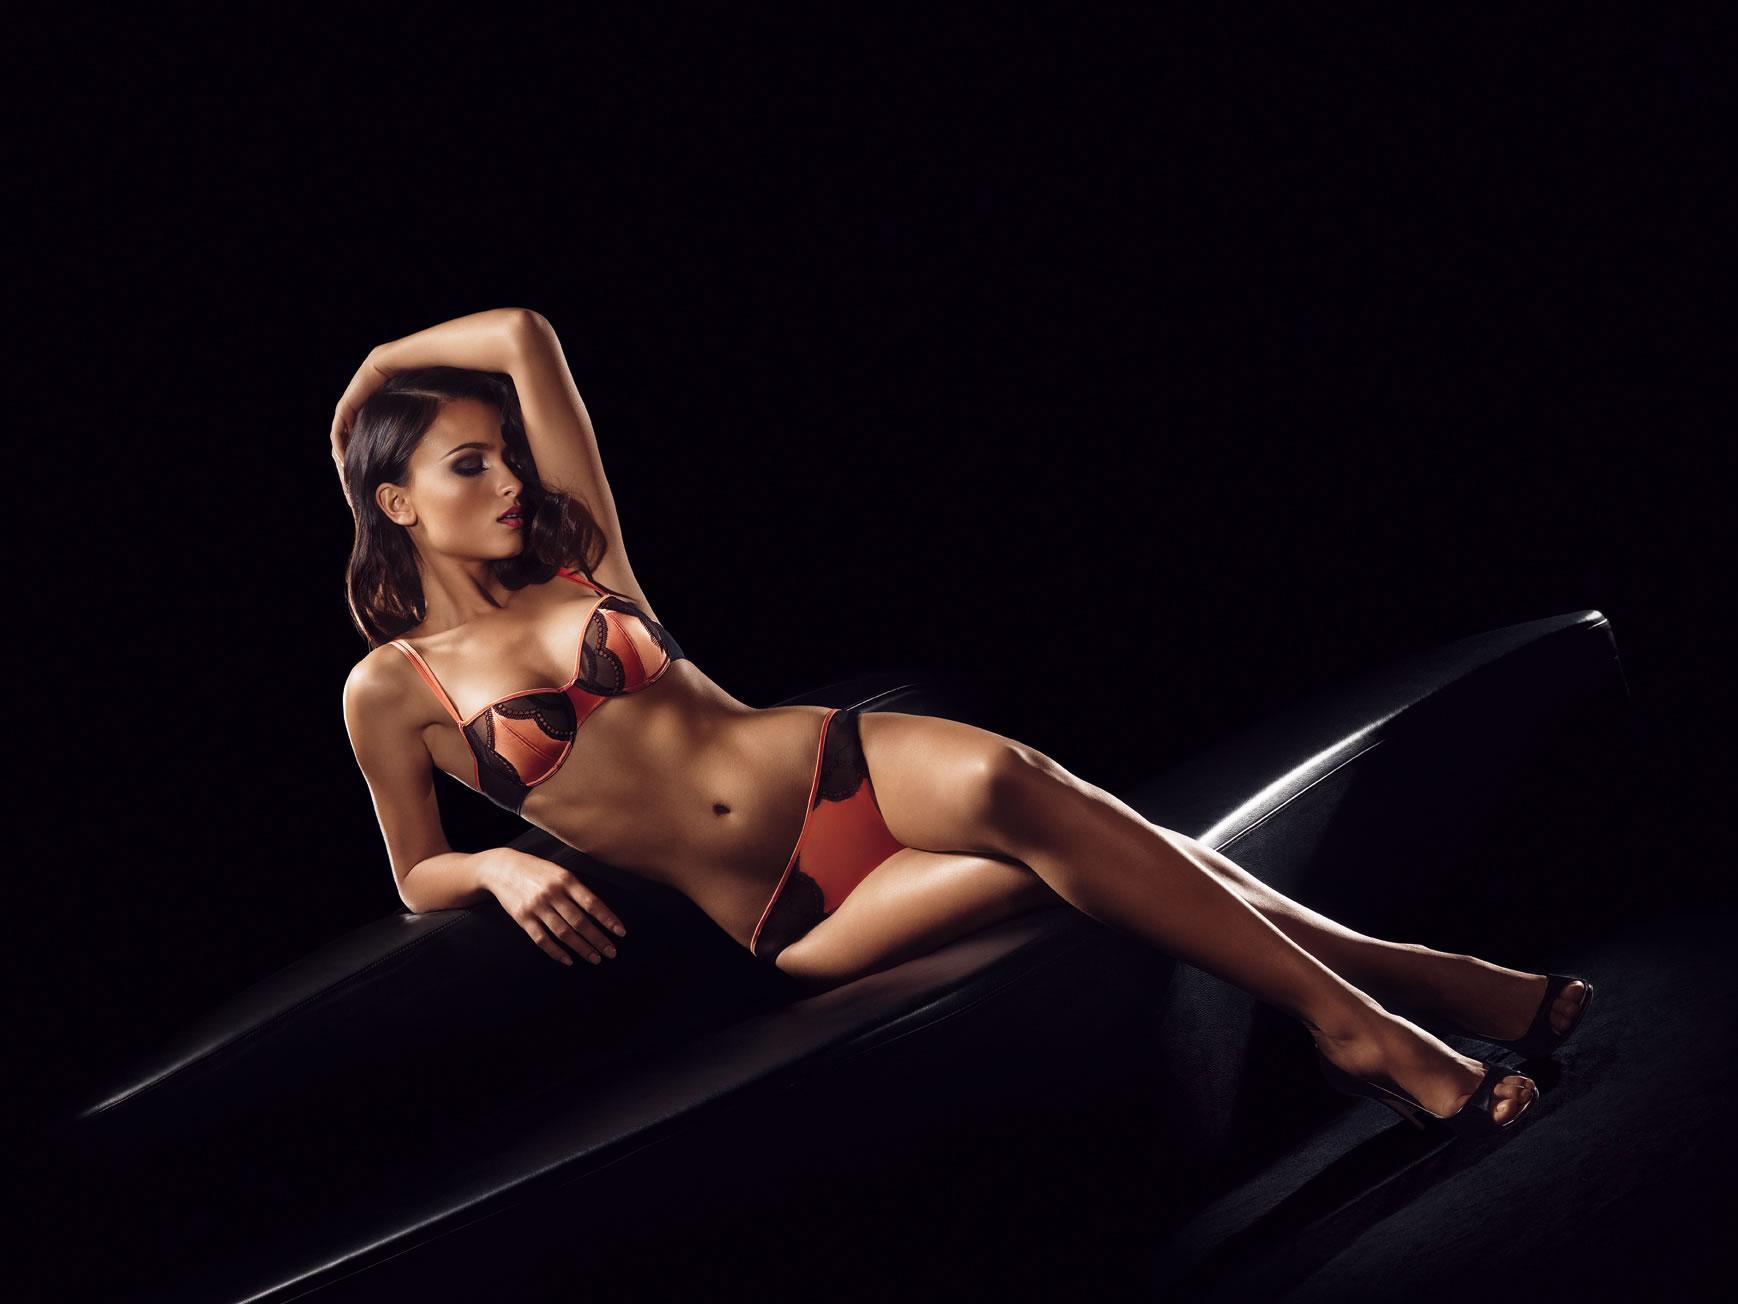 foren erotik erotische waesche fuer ueppige frauen